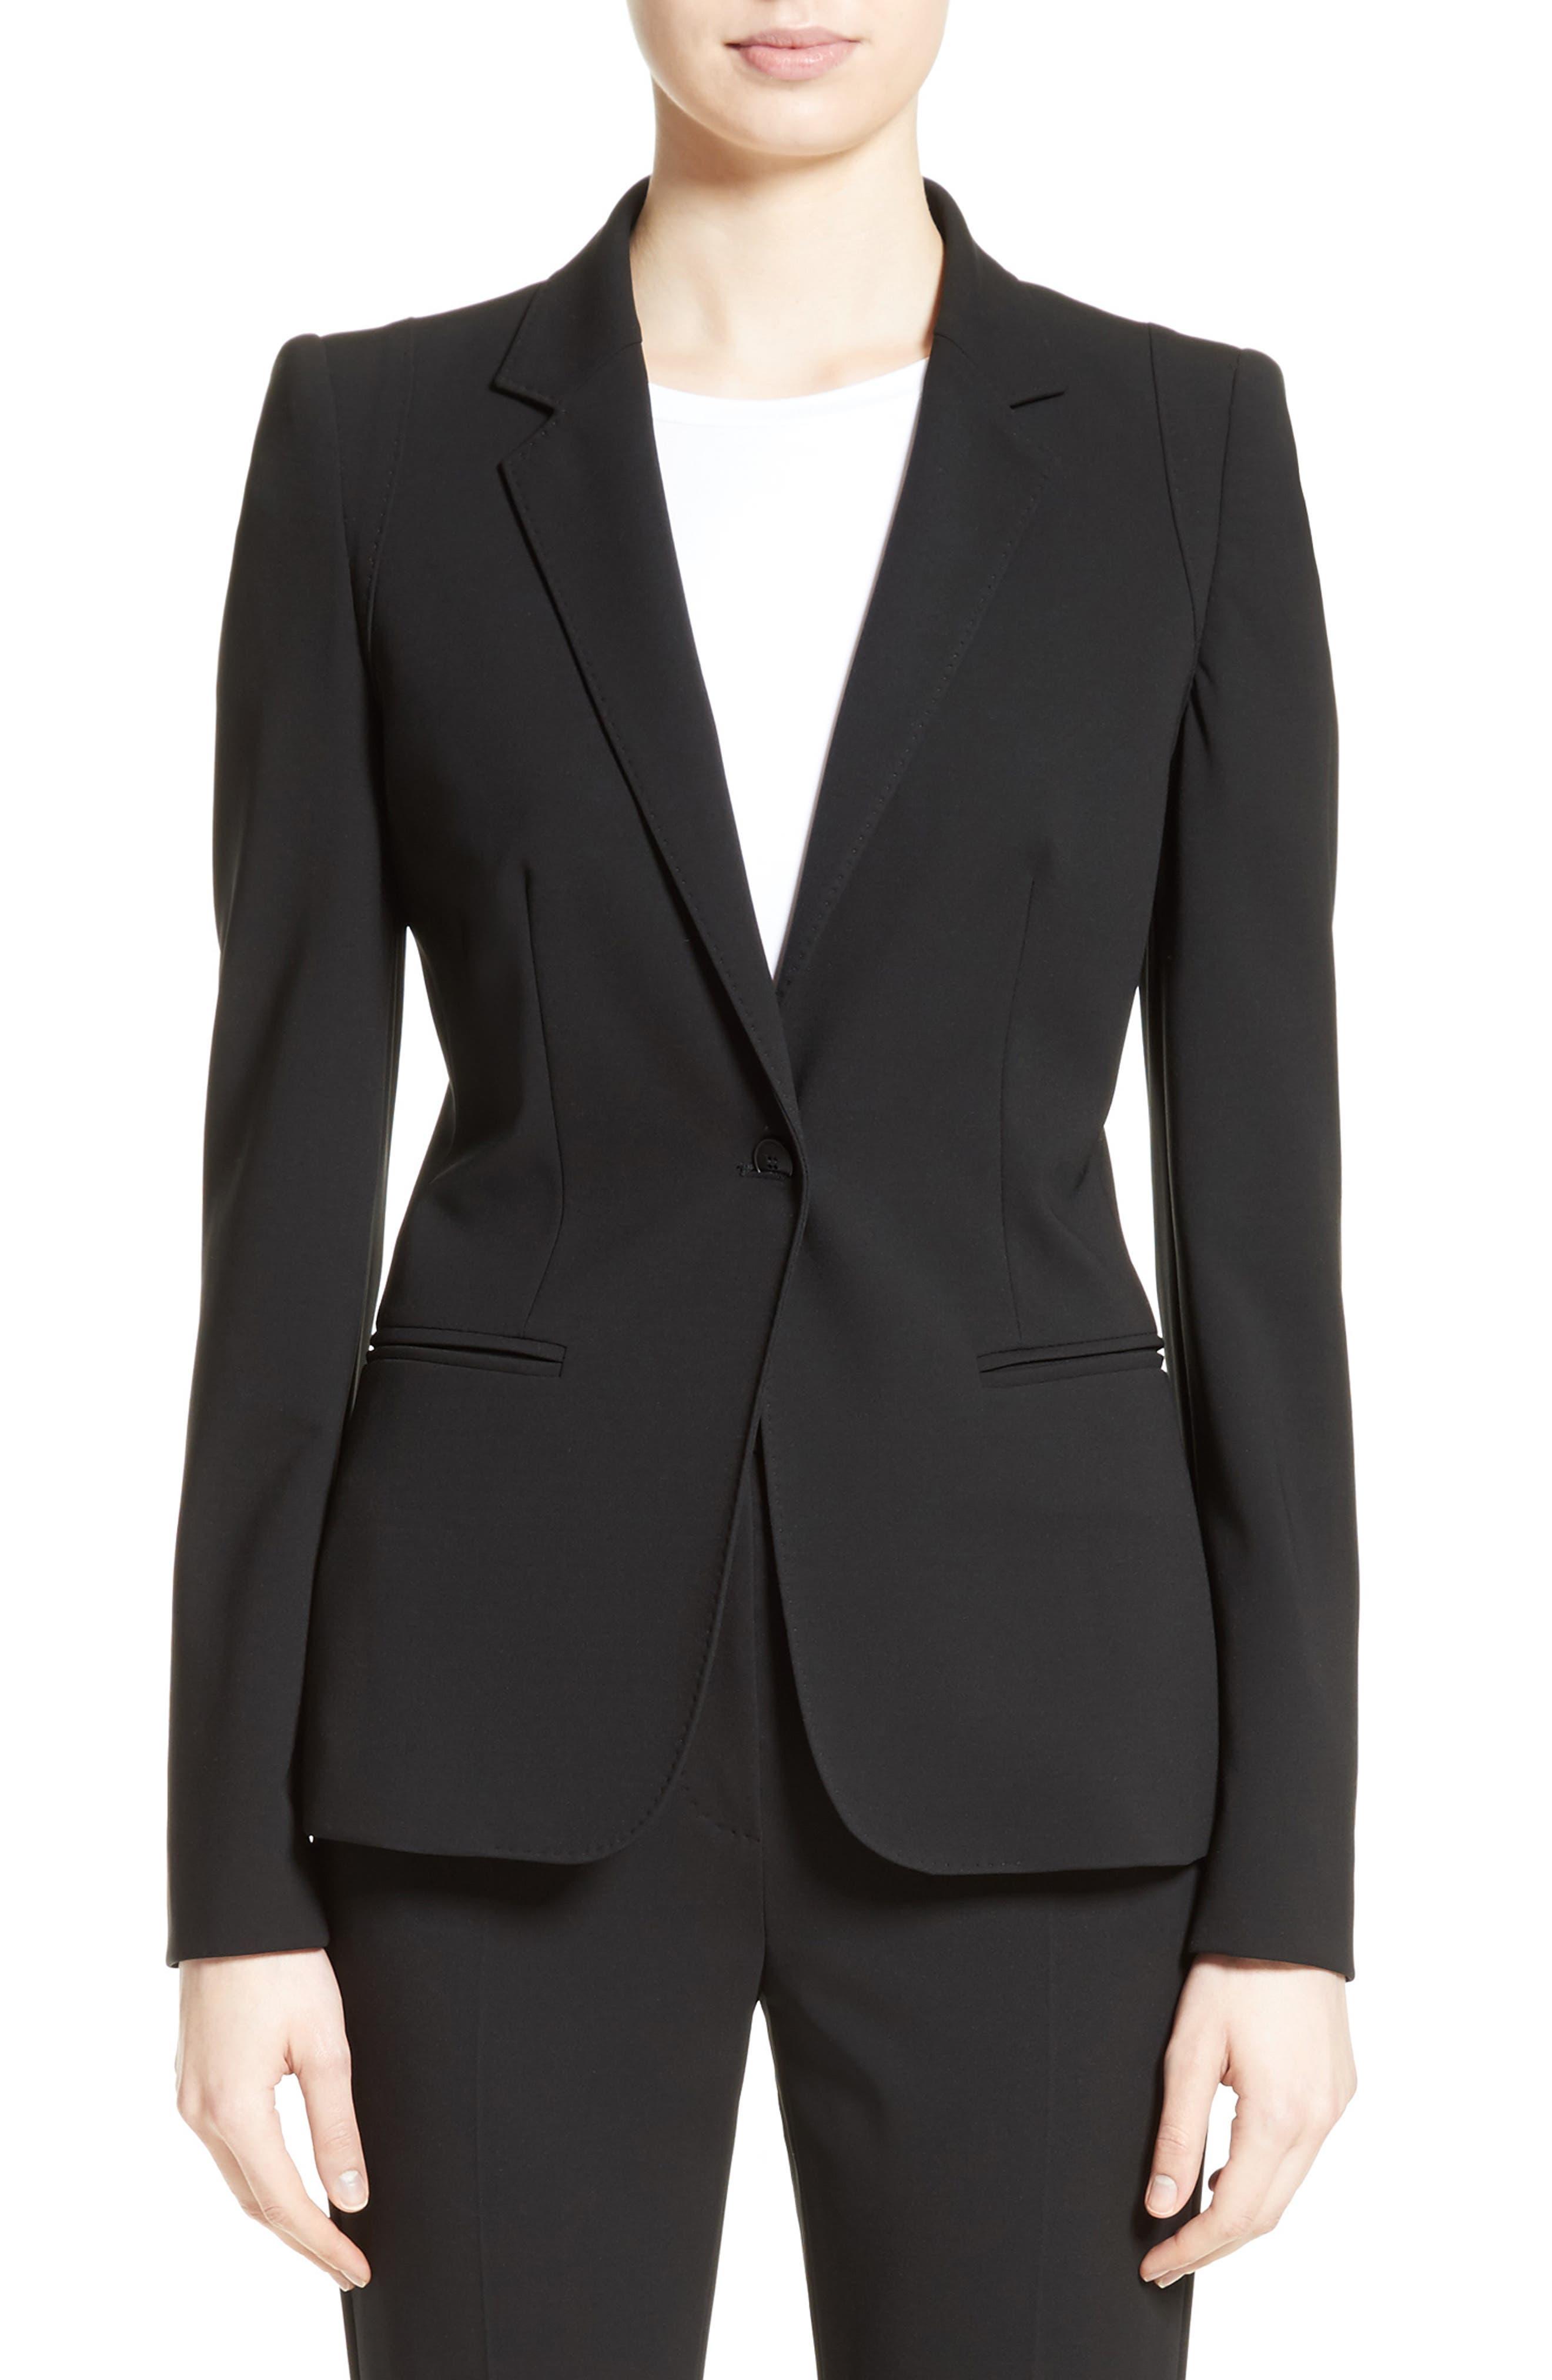 Main Image - Max Mara Bari Stretch Jersey Jacket